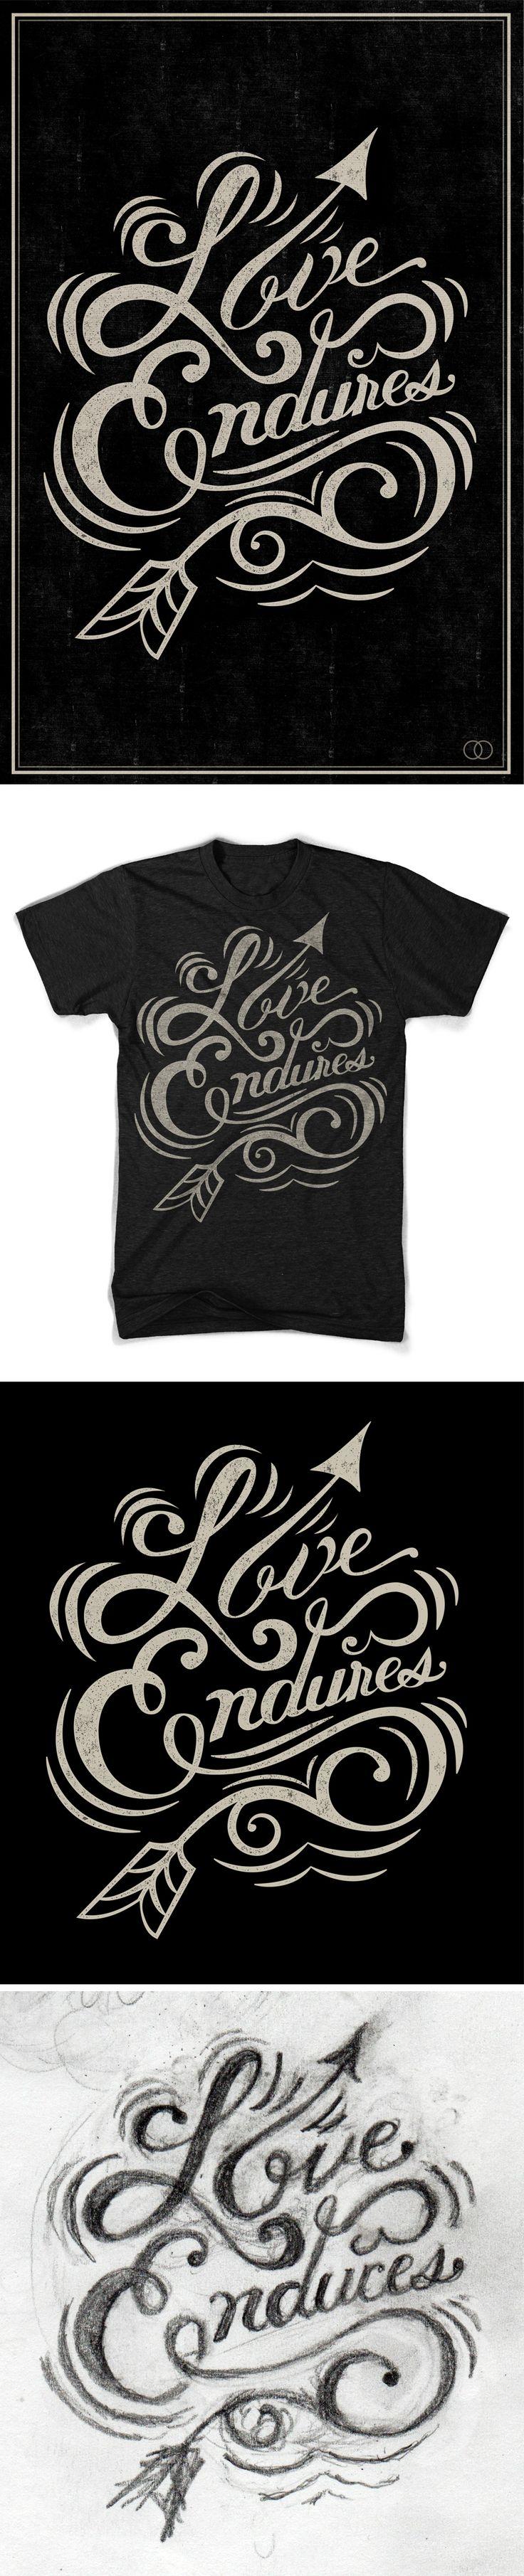 Shirt design uber - Love Endures Nicholas D Amico Diy Stencil T Shirt Design